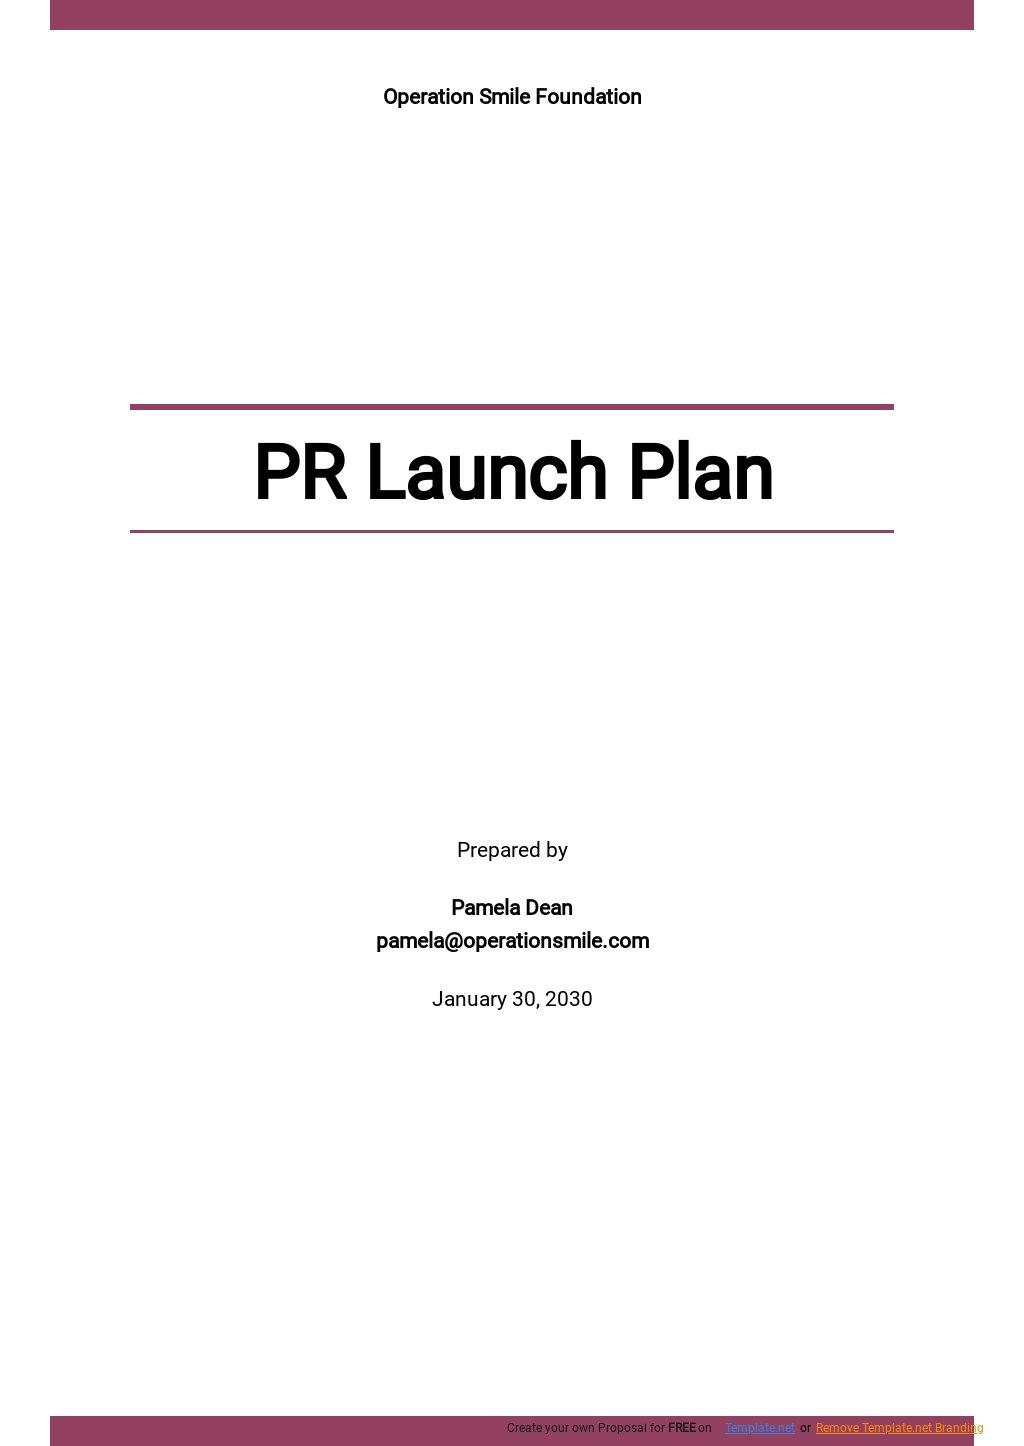 PR Launch Plan Template.jpe